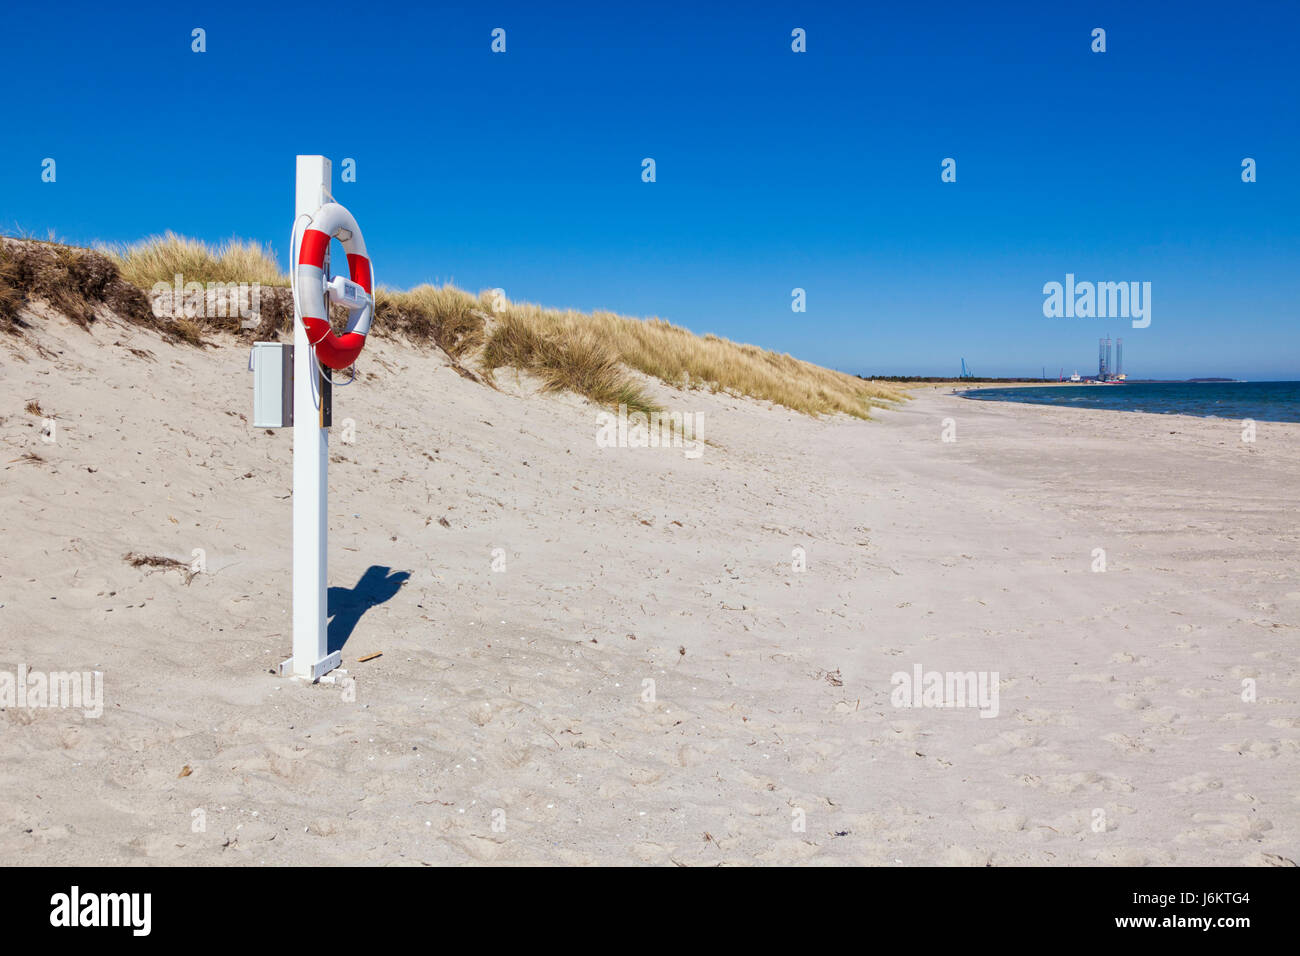 Grenaa, Djursland peninsula, Jutland, Denmark - Life buoy at Grenaa Strand beach. Harbor in background - Stock Image